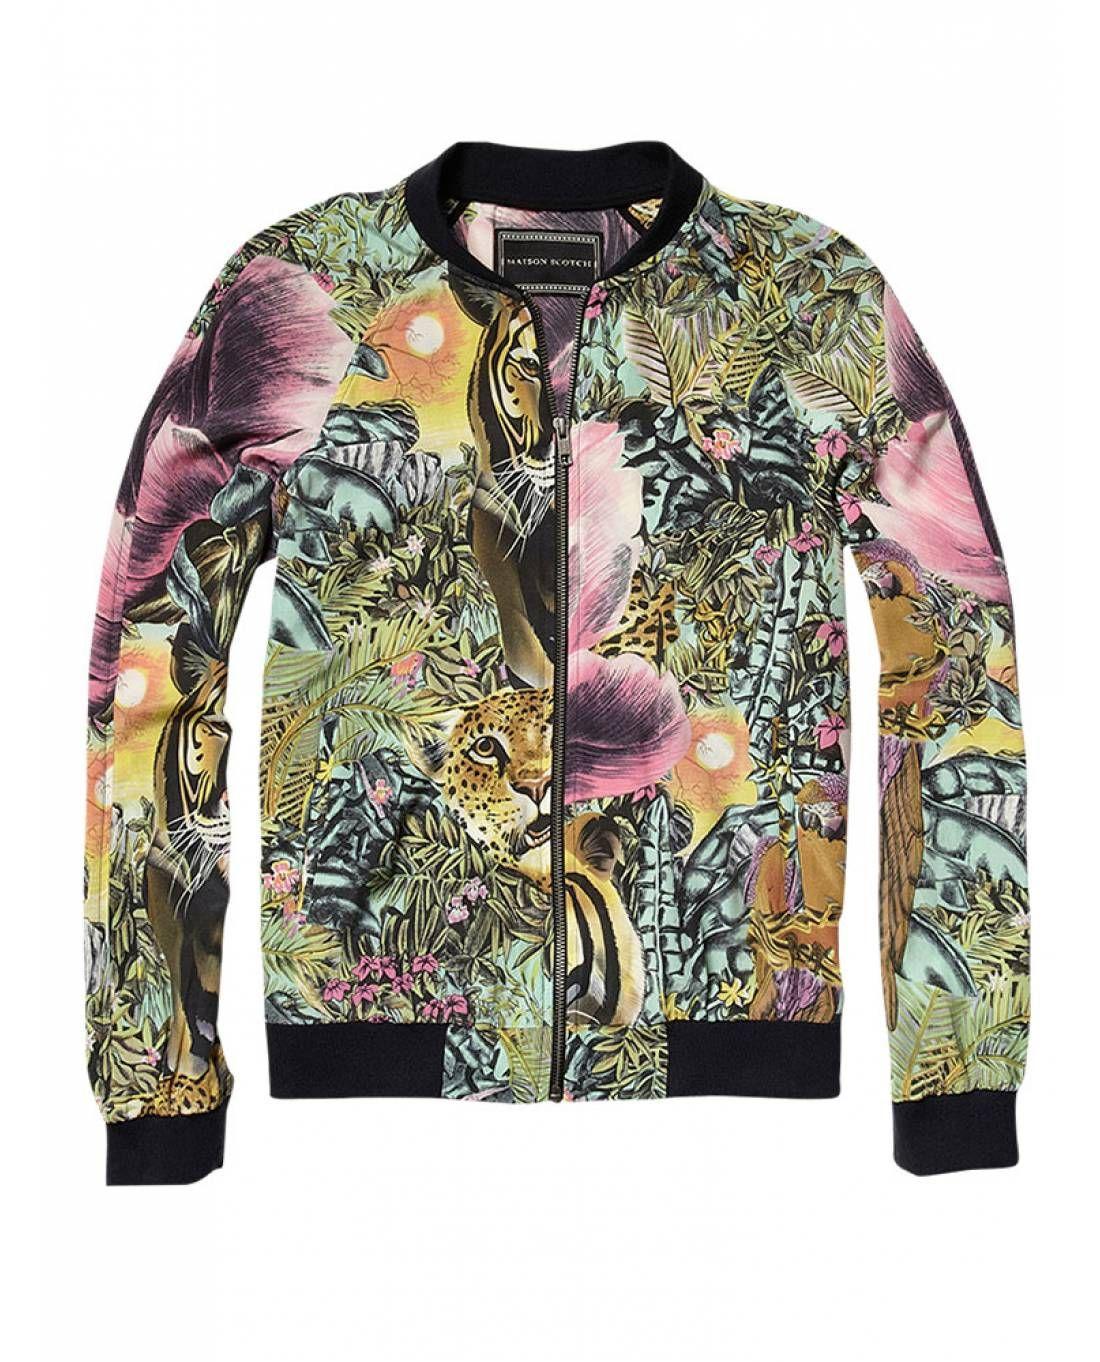 ba82604c093845 Tropical printed silky bomber jacket - Jackets - Scotch   Soda Online  Fashion   Apparel Shop